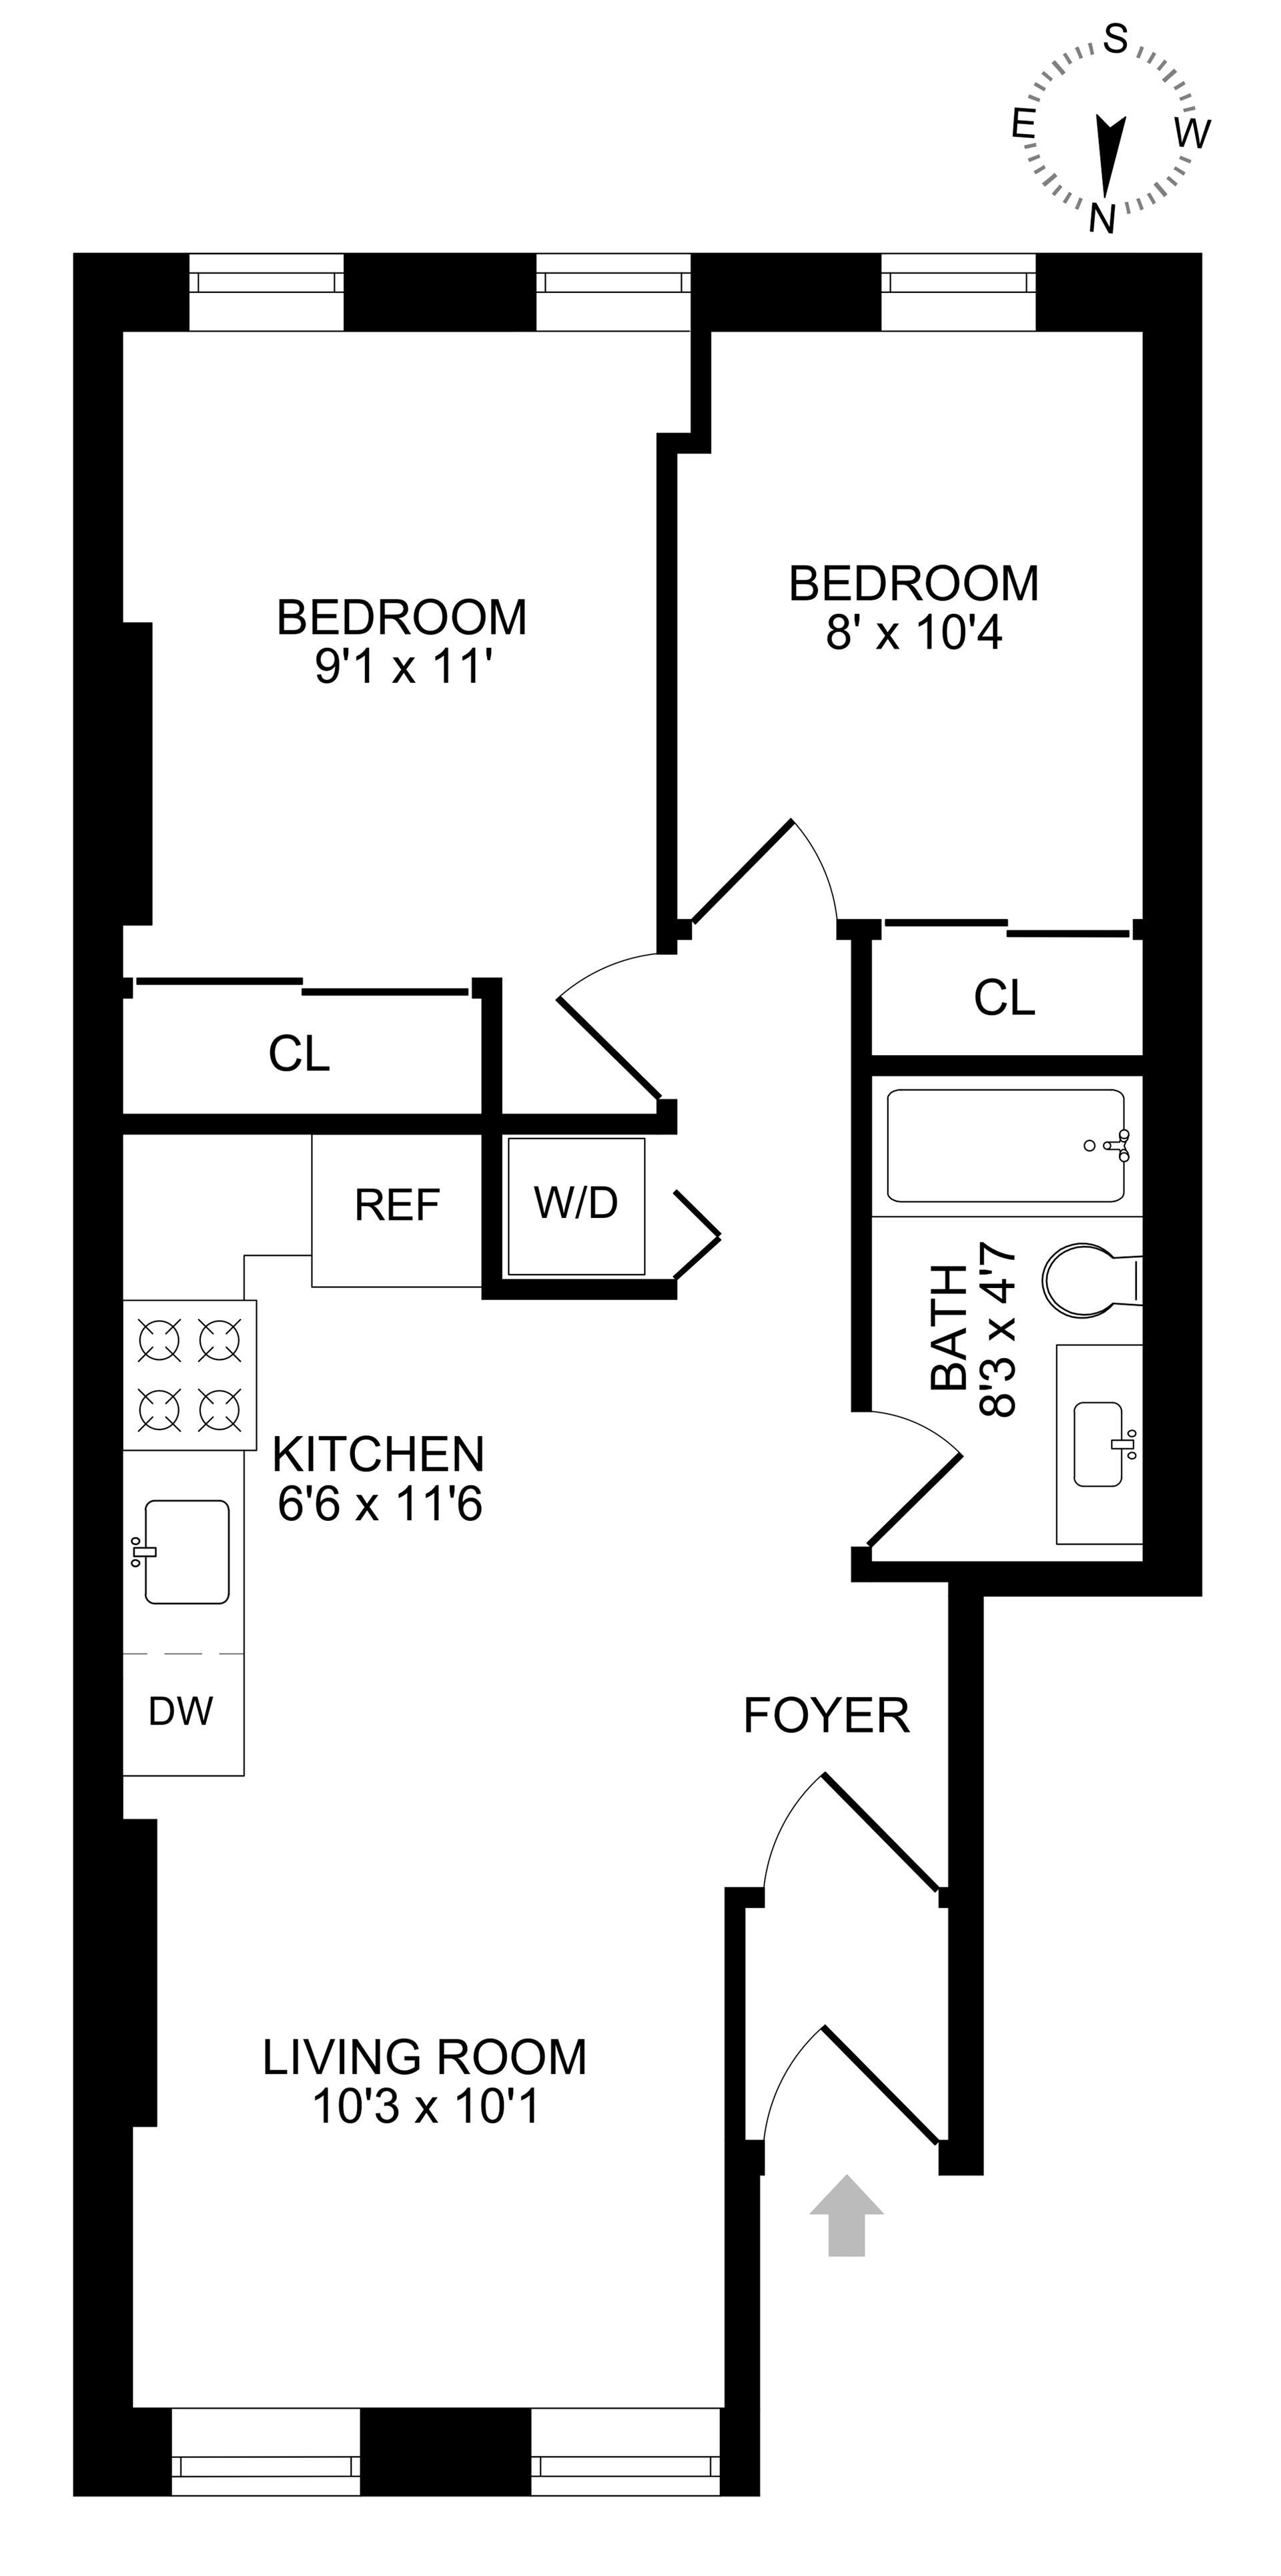 Floor plan of 442 Lexington Avenue, 2 - Bedford - Stuyvesant, New York